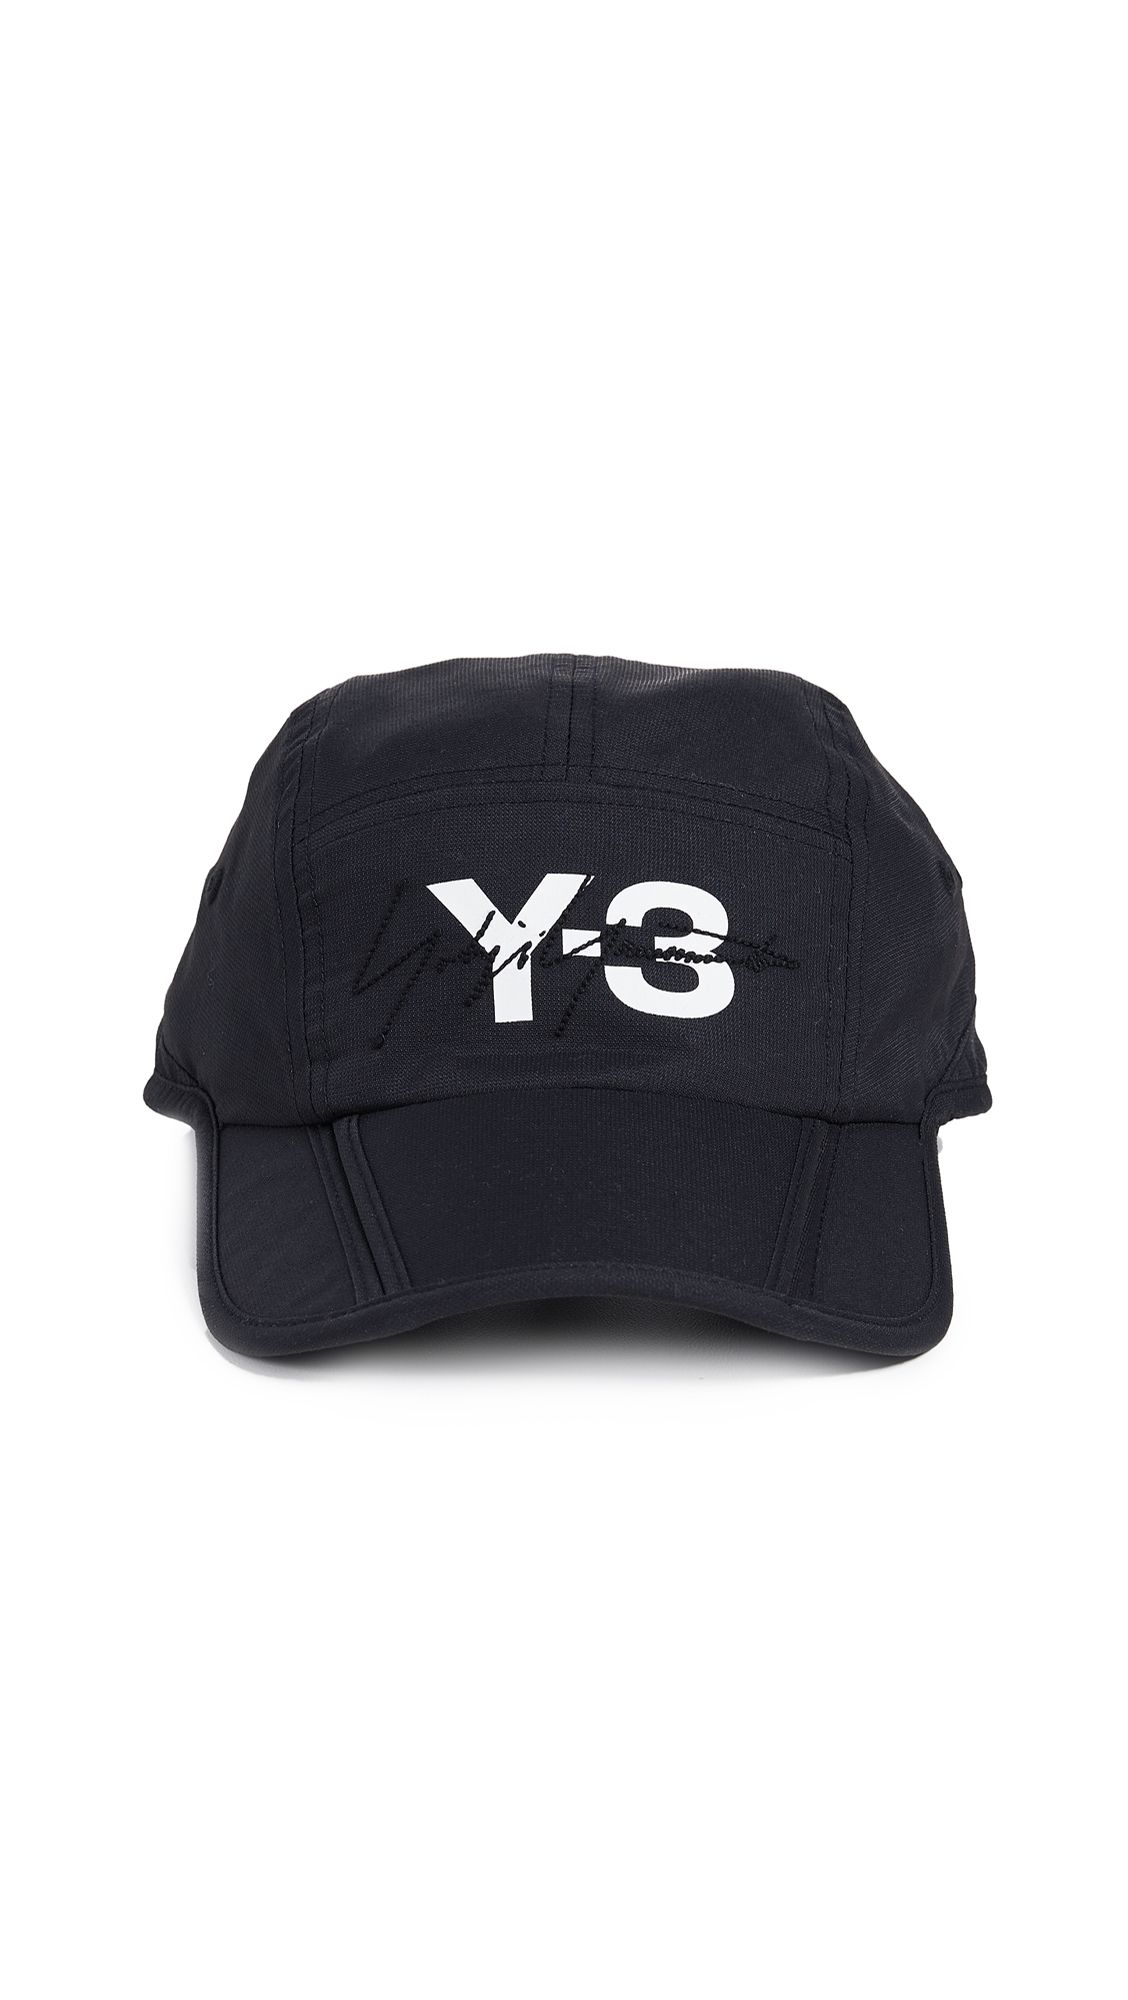 e31e220465e Y-3 FOLDABLE CAP.  y-3